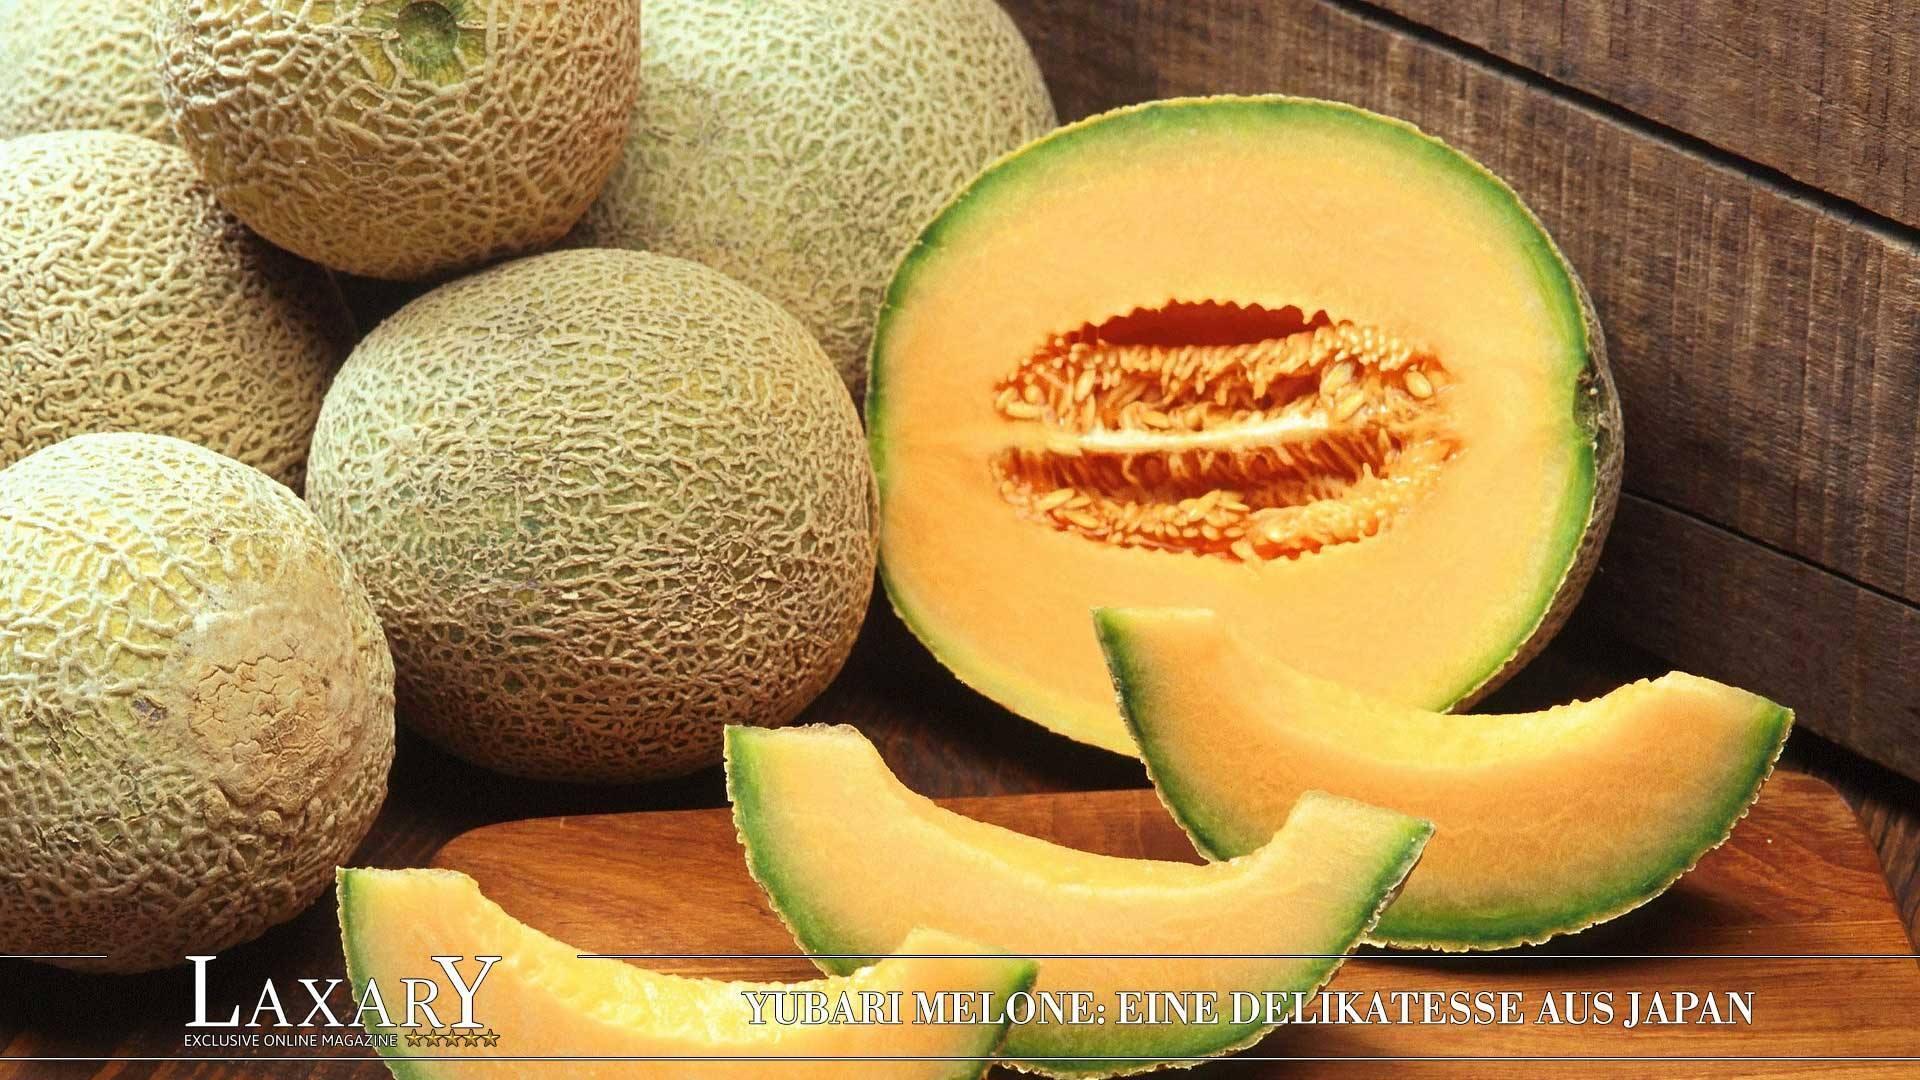 Yubari Melone: eine Delikatesse aus Japan